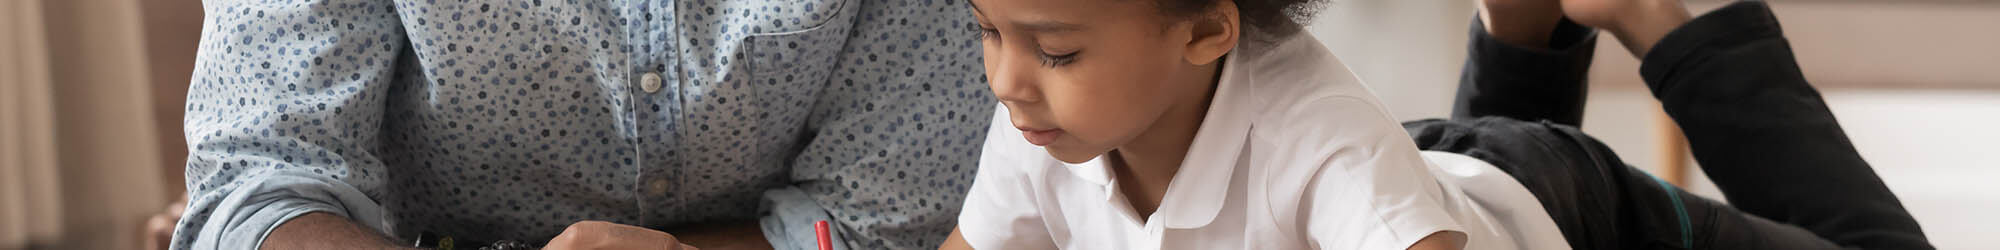 child custody attorneys in Birmingham